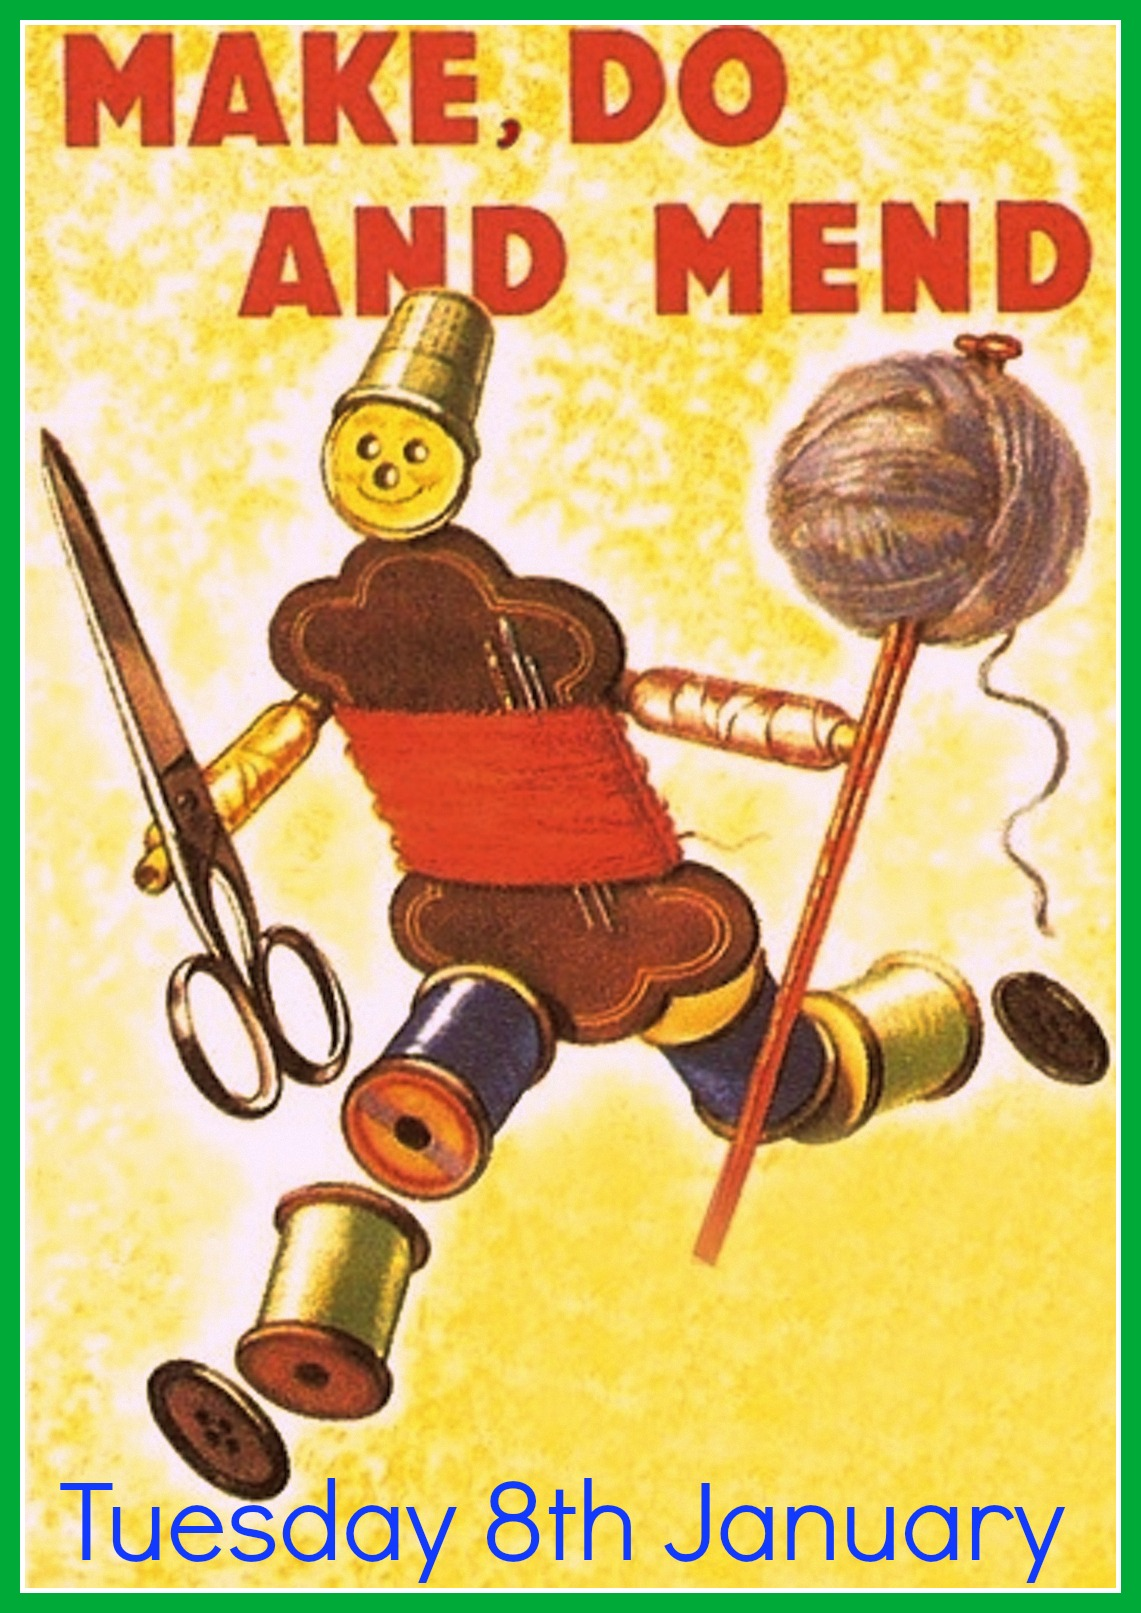 make, do & mend man January 2013